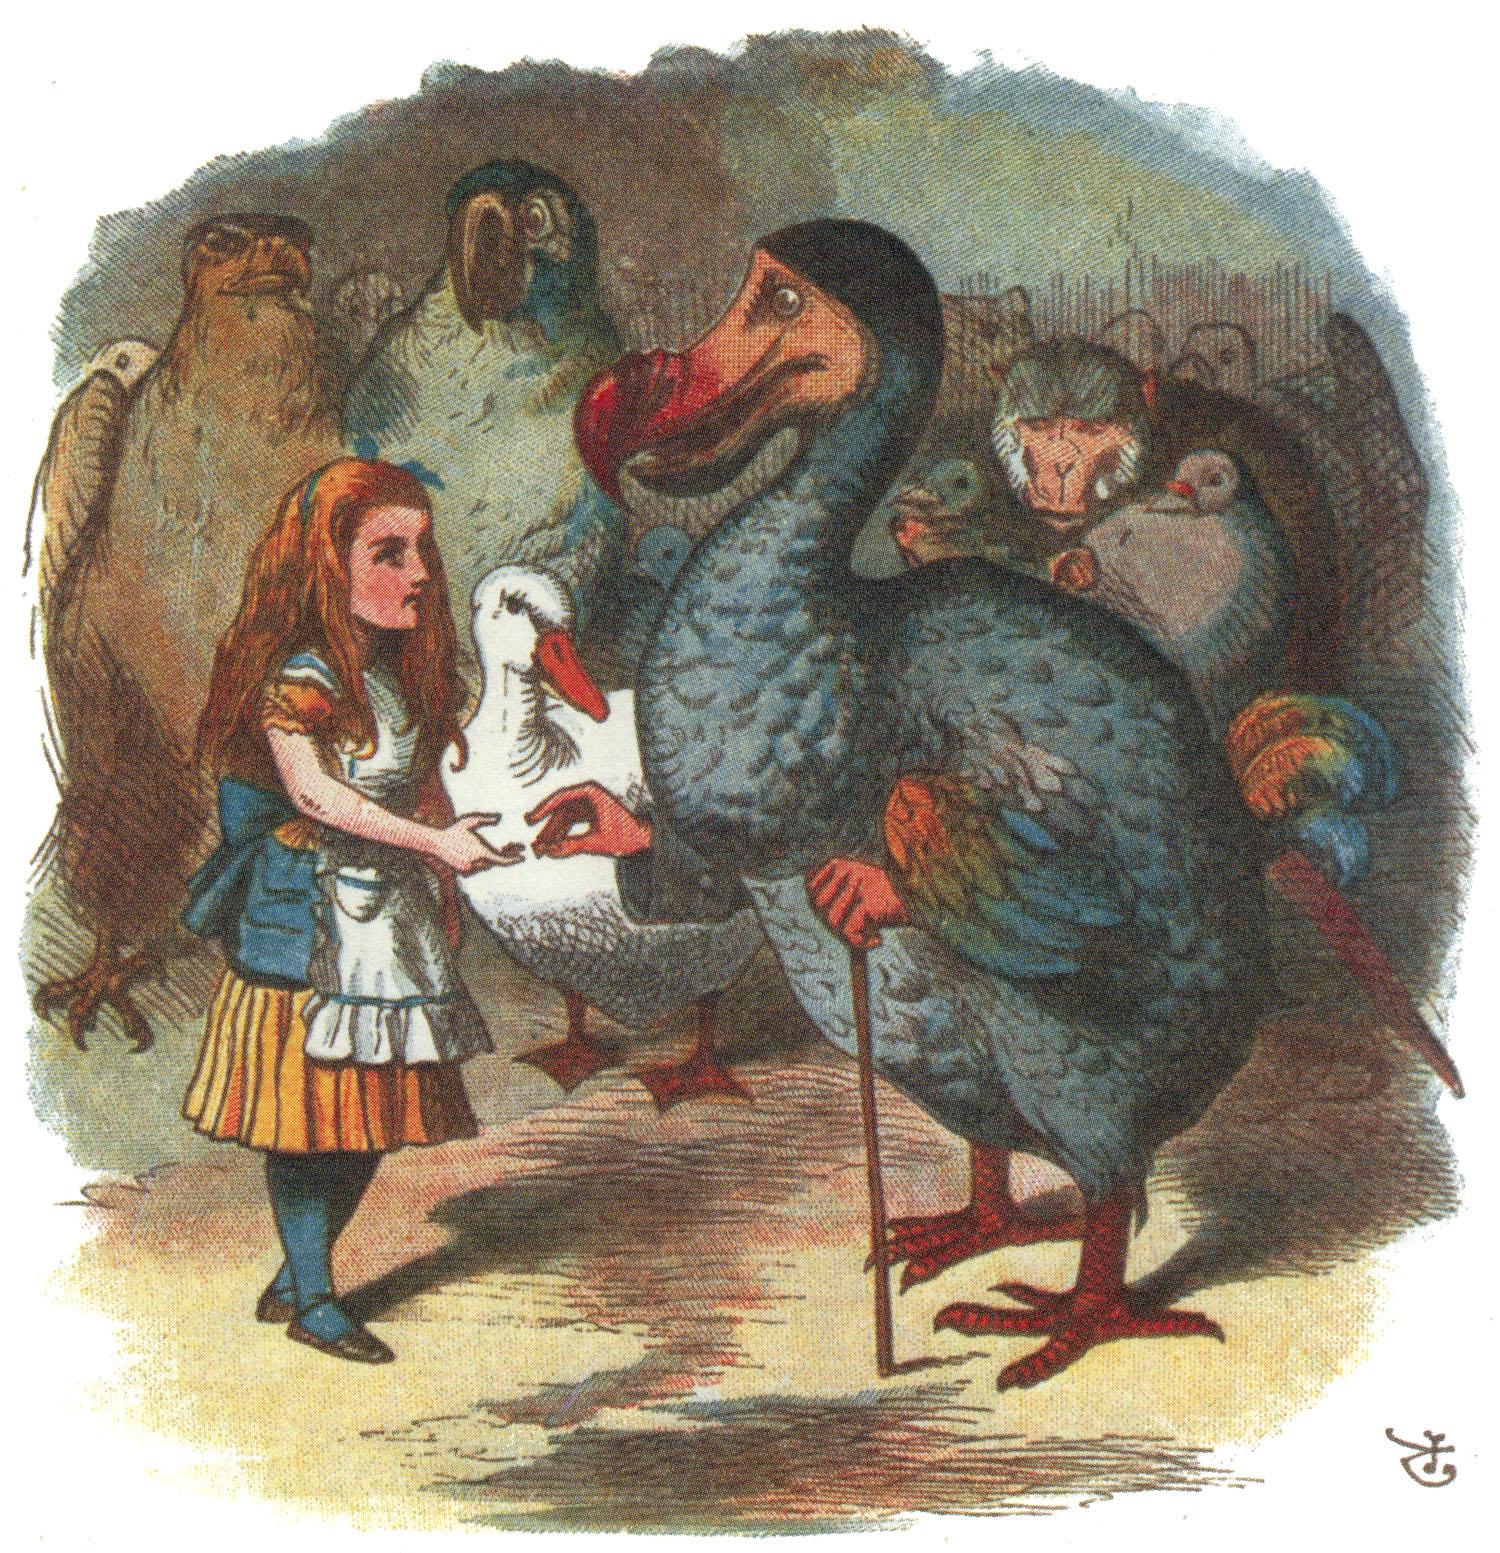 Dodo handing Alice a thimble, colored